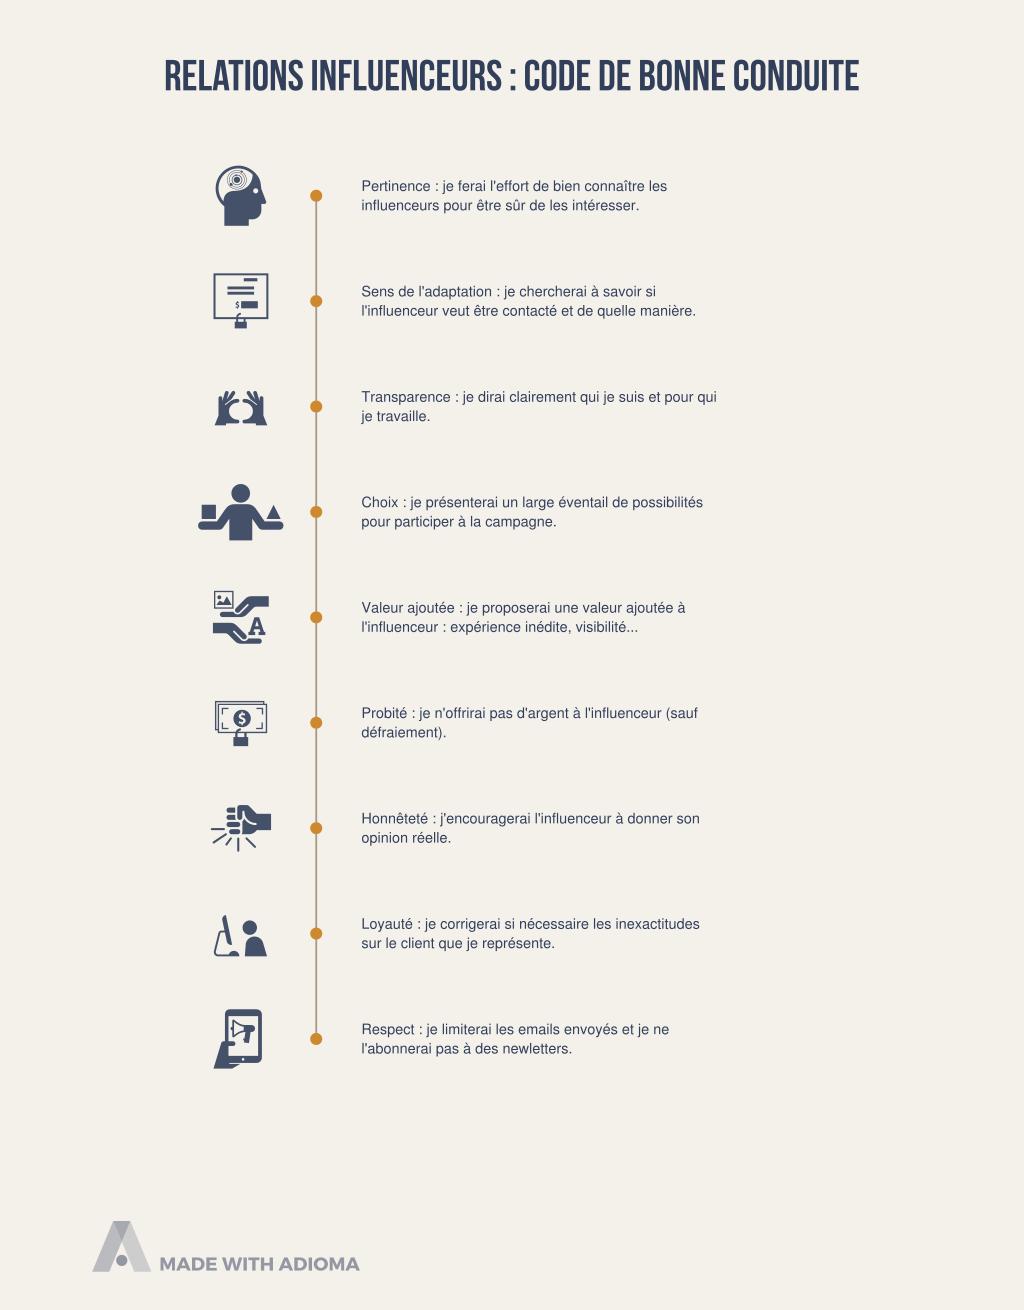 Relations influenceurs : code de bonne conduite